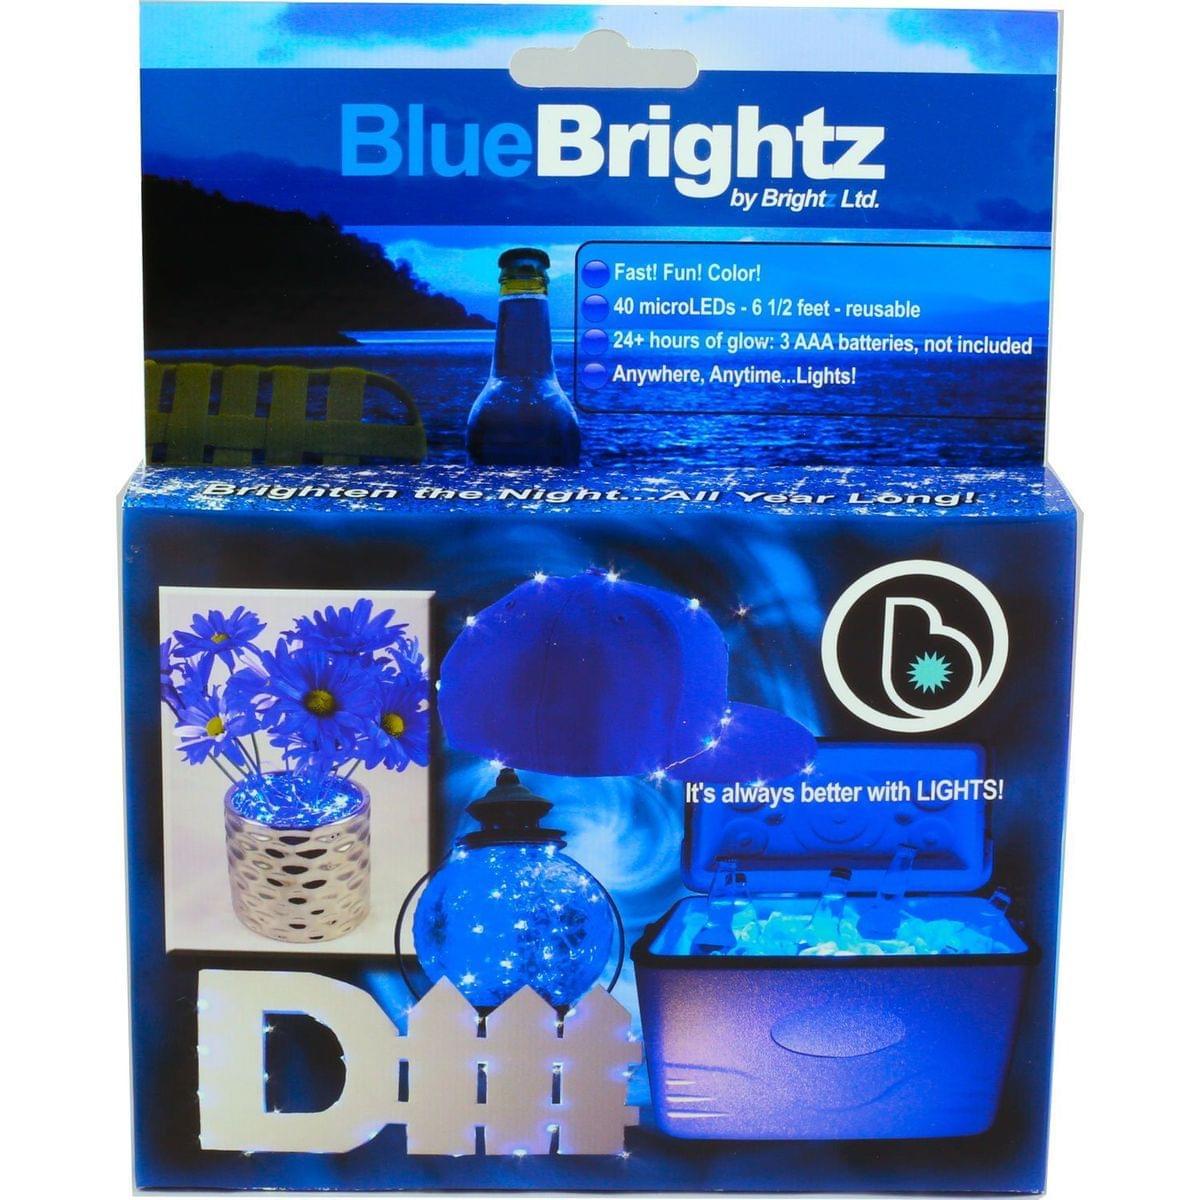 Everyday Color Brightz LED Light Accessory: Blue